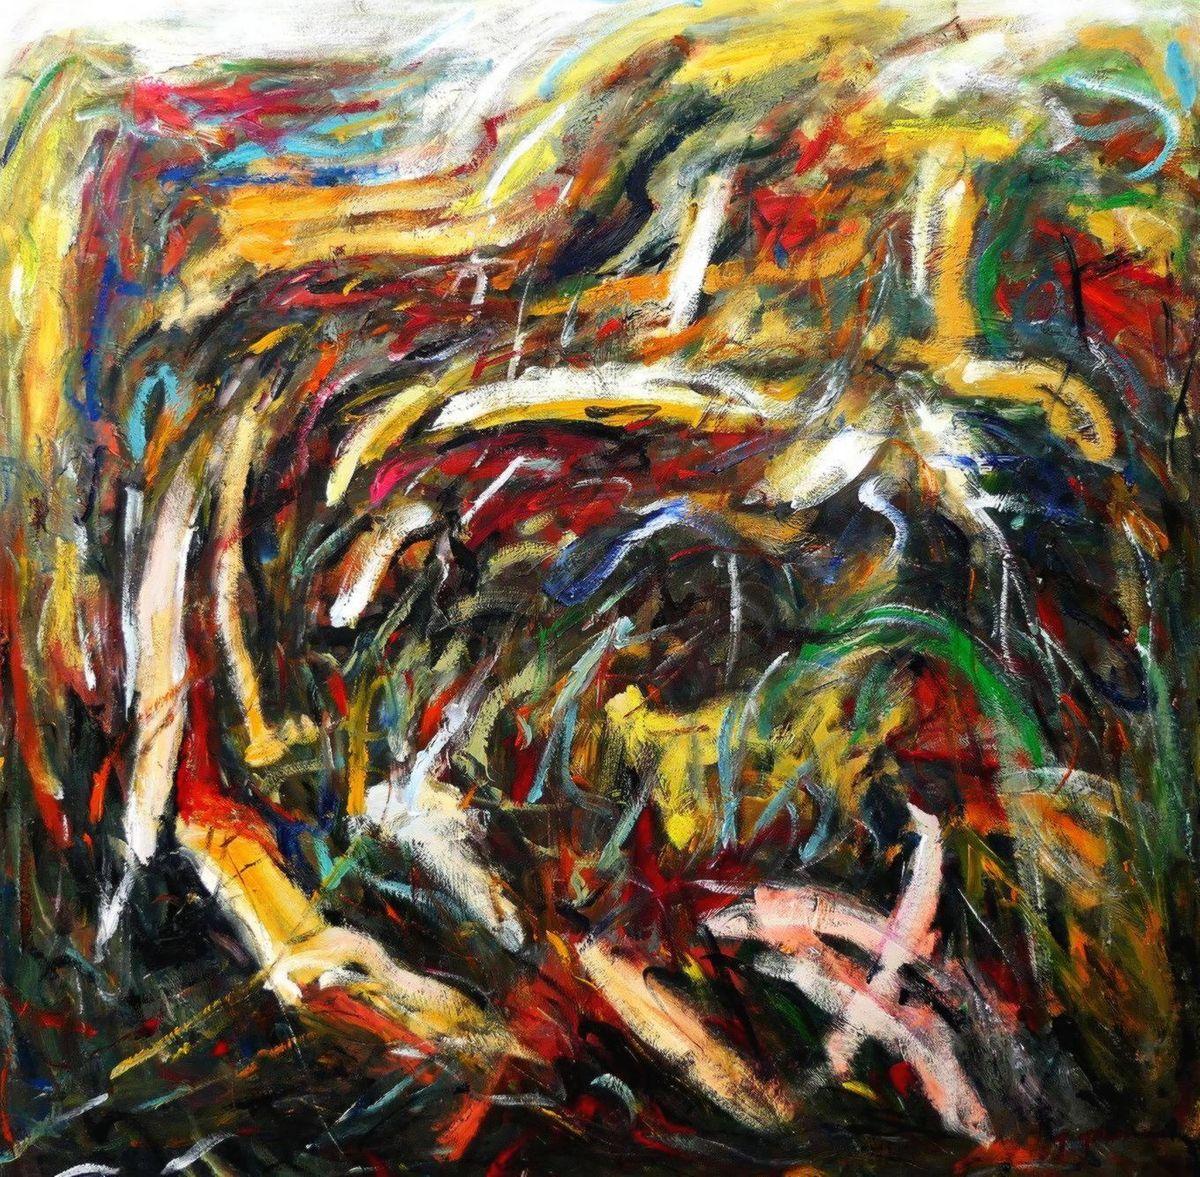 Abstract - Into the wild m97181 120x120cm abstraktes Ölgemälde handgemalt